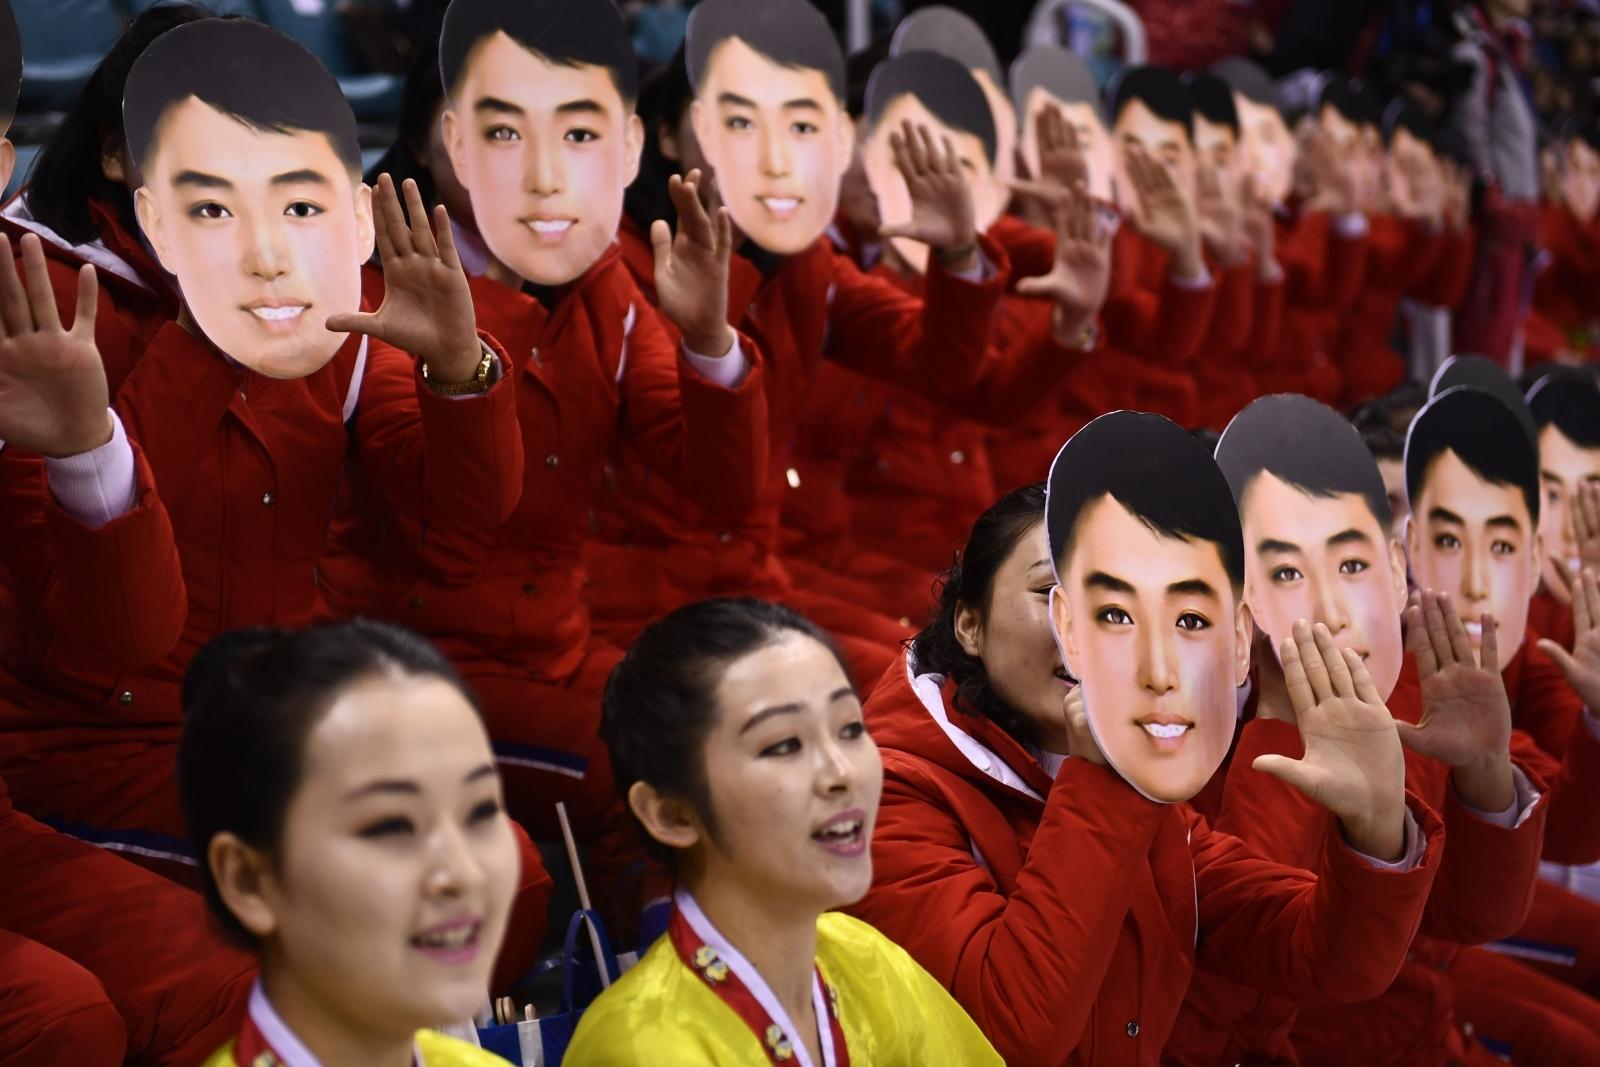 North Korean cheerleaders wearing Kim Il-sung masks